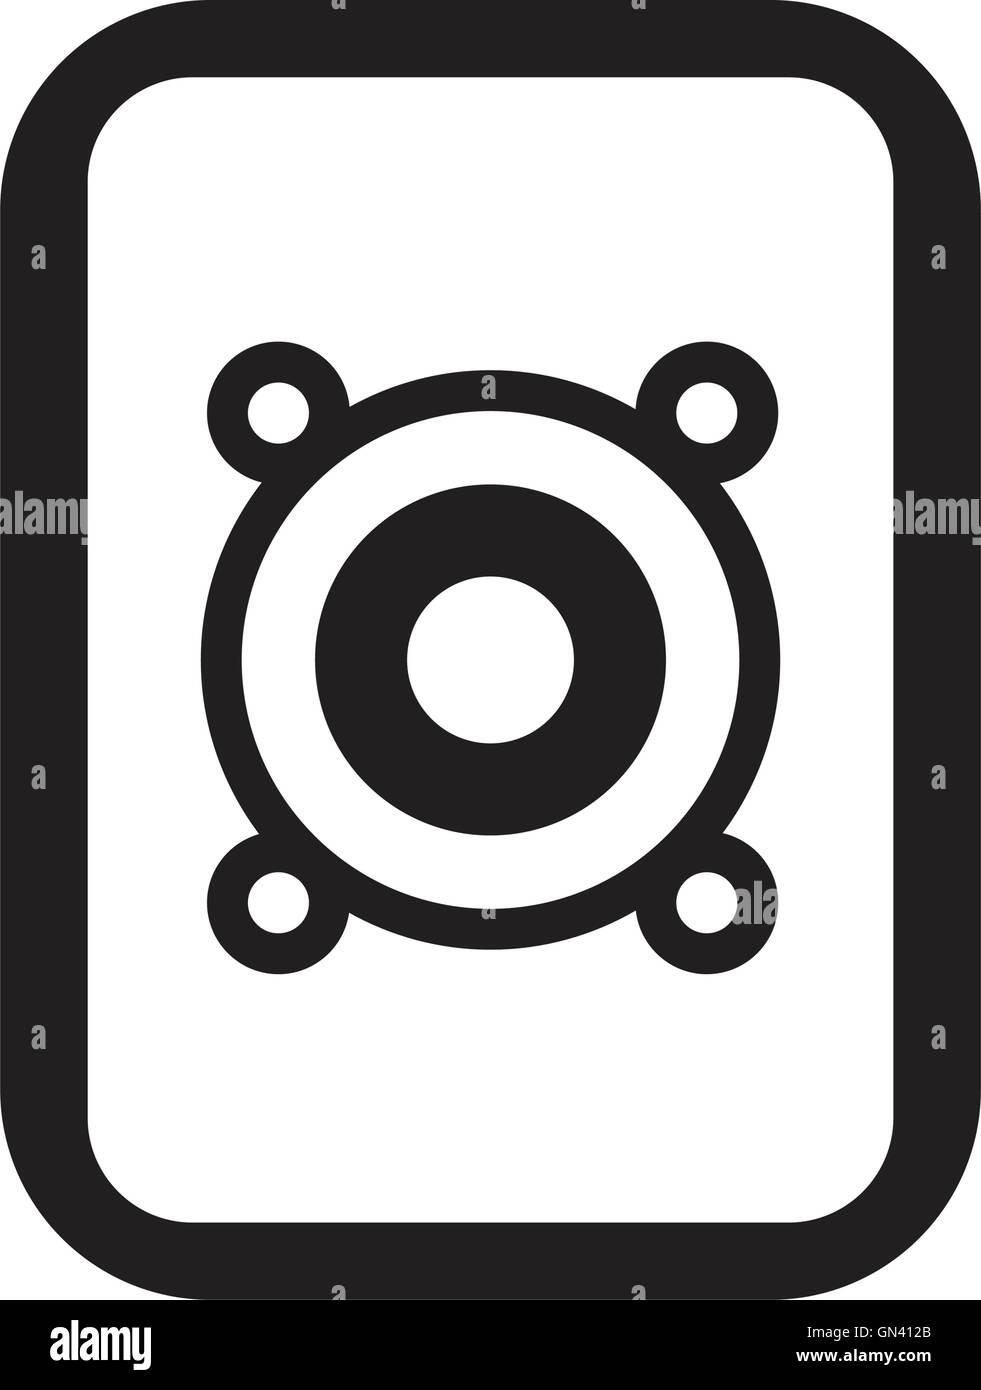 Loud Music Icon Stock Vector Art Illustration Vector Image